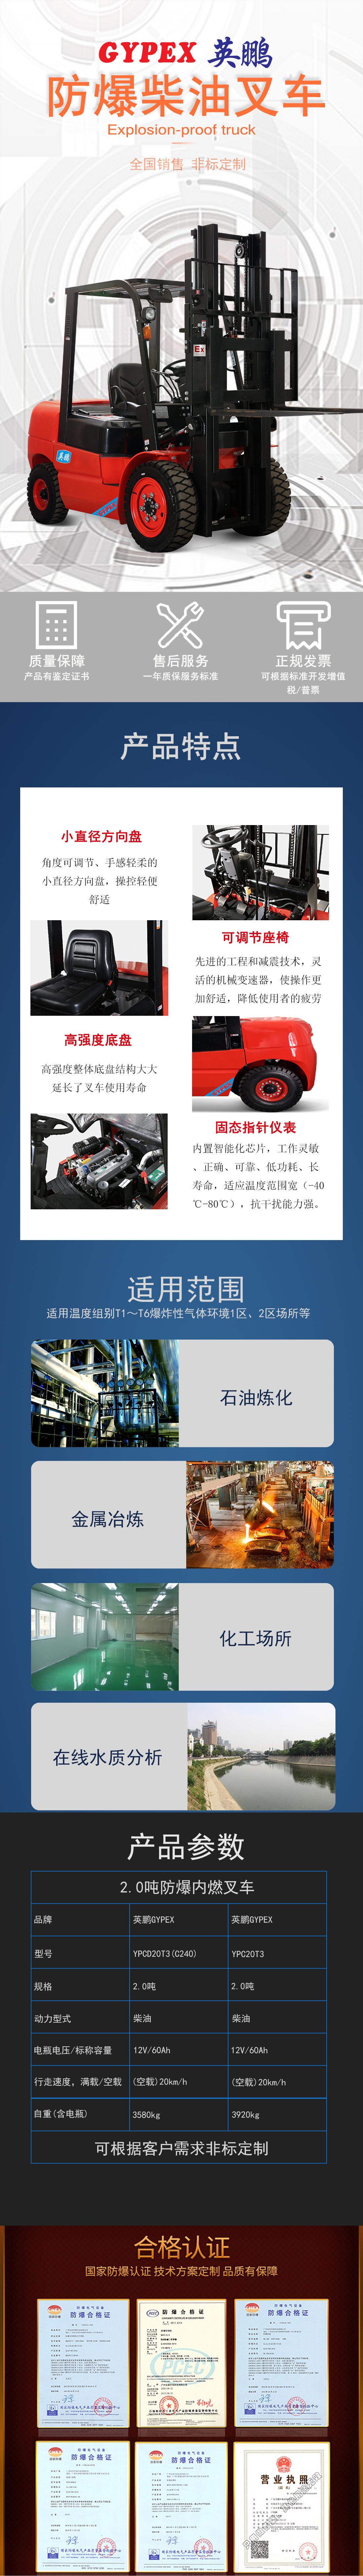 YPCD20T3(C240) YPC20T3詳情圖.jpg